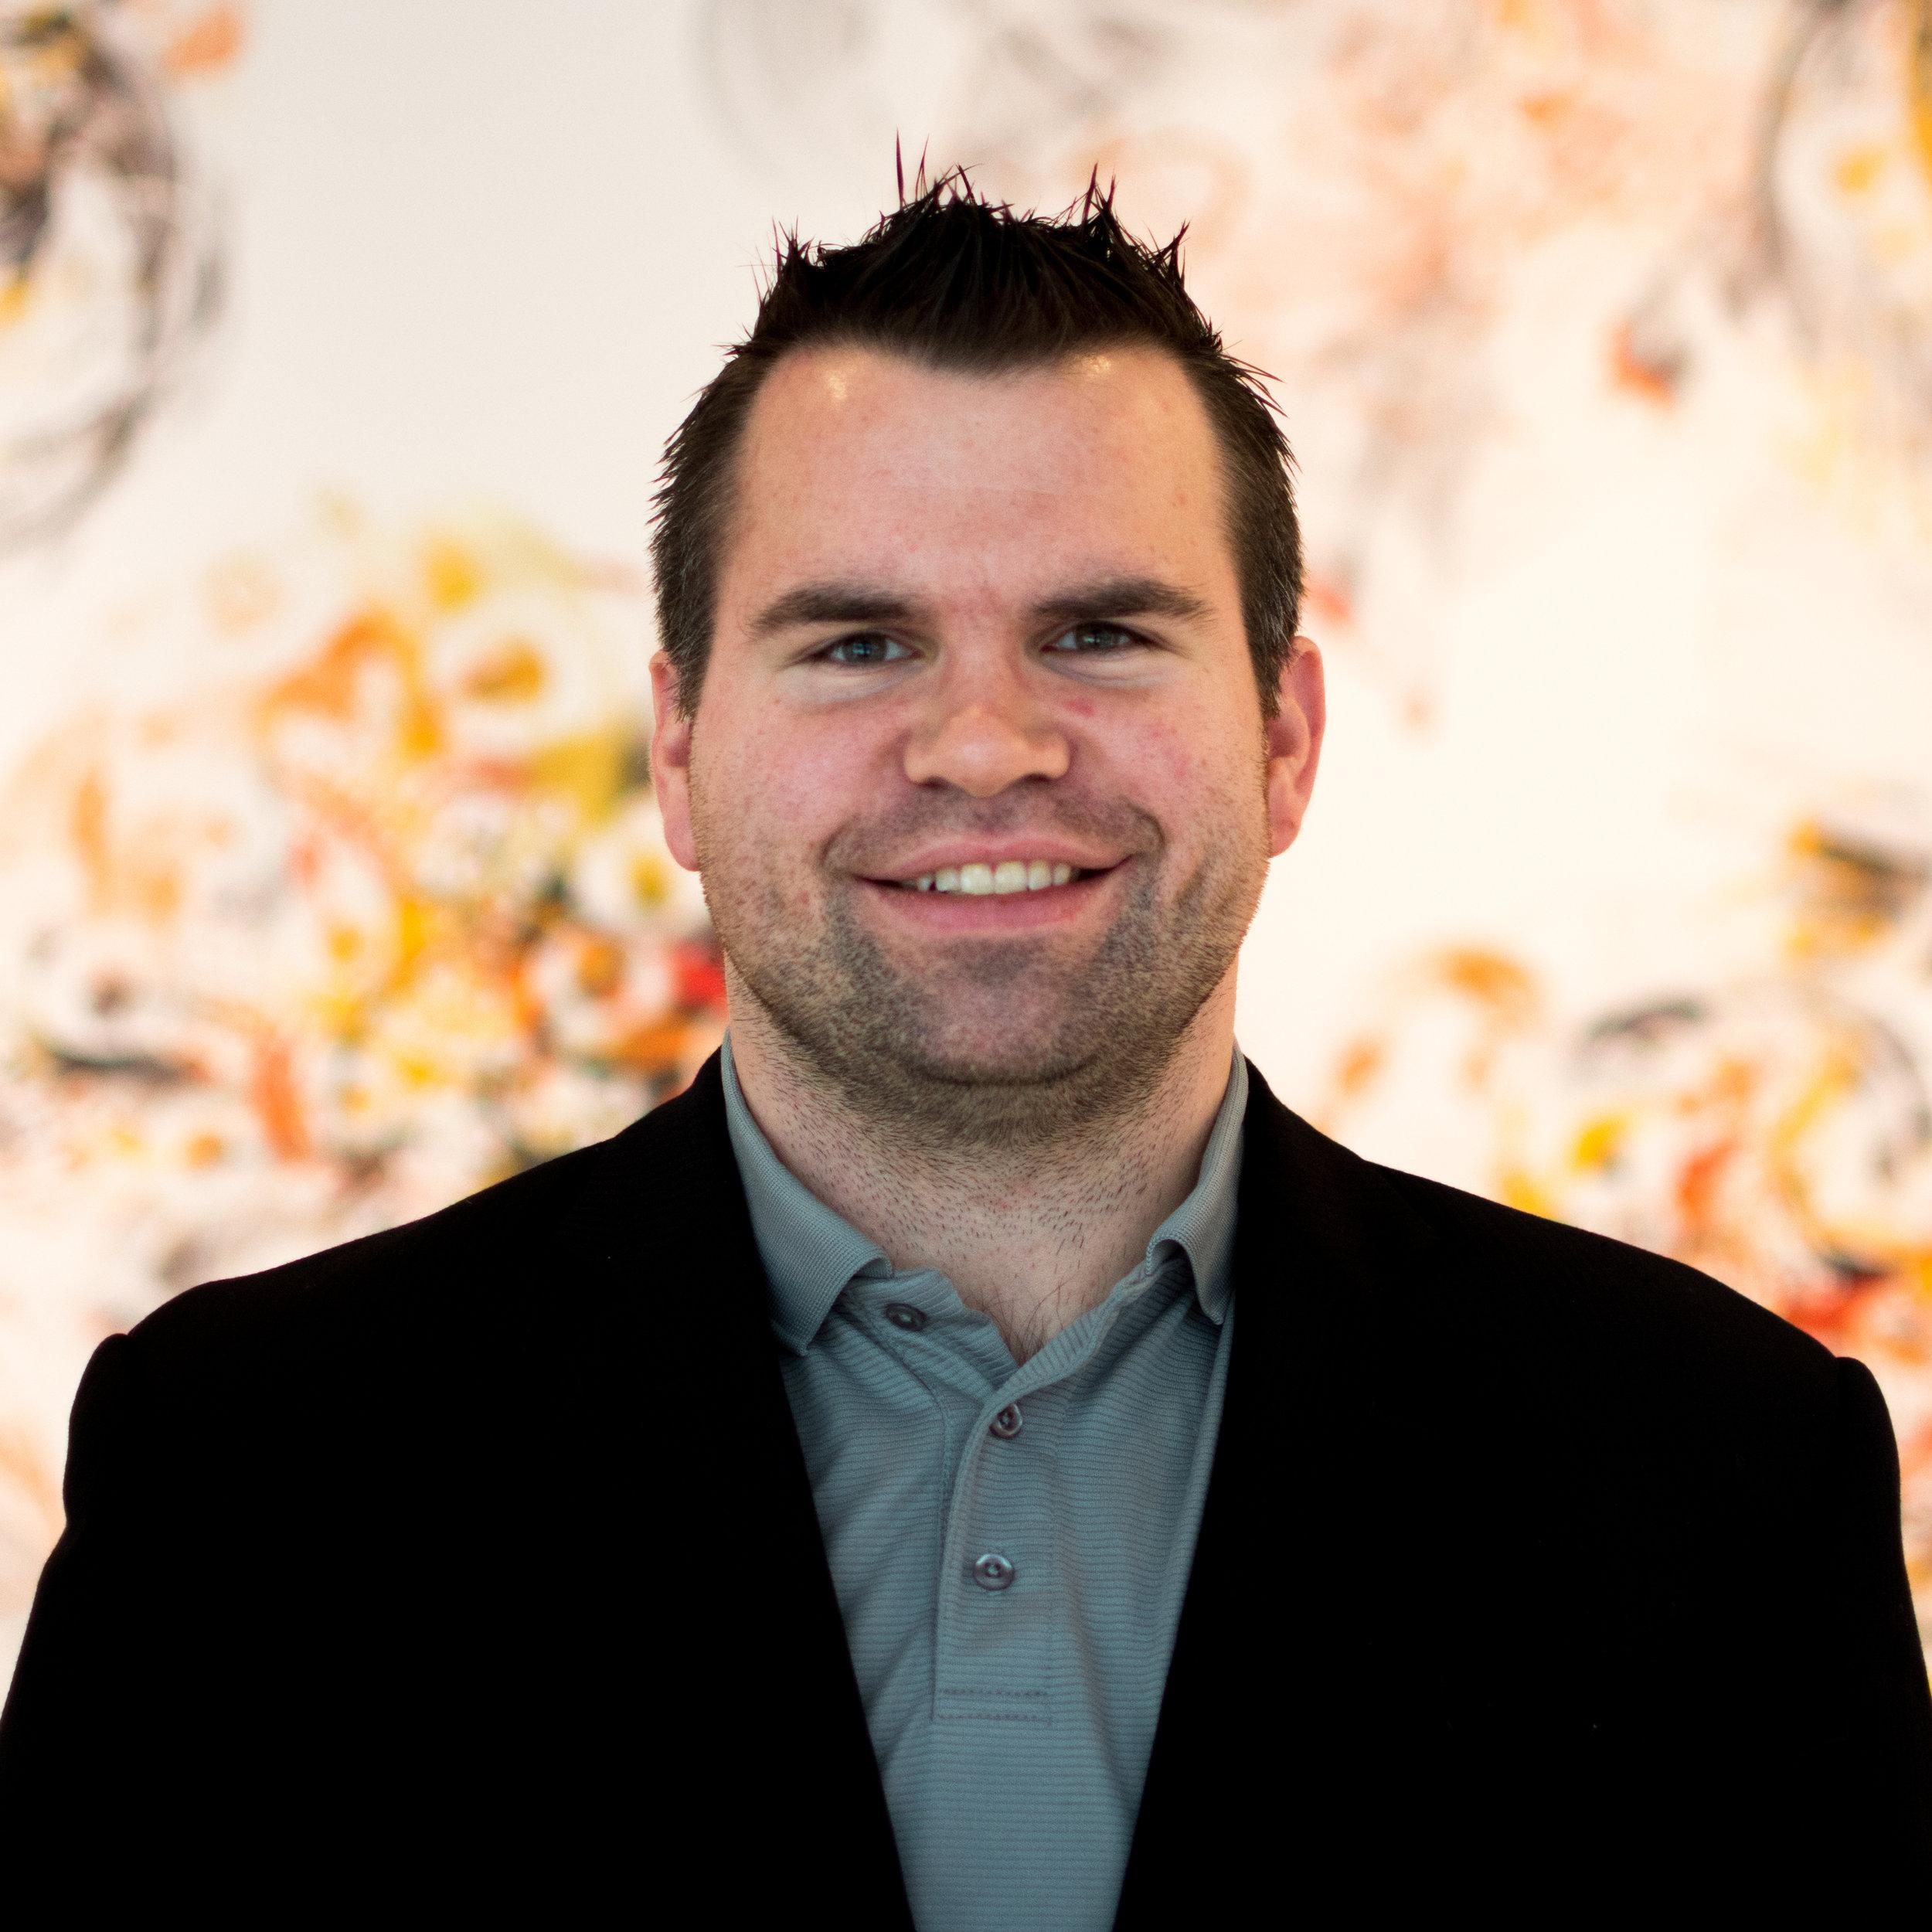 Michael McDonald - MCI Coach